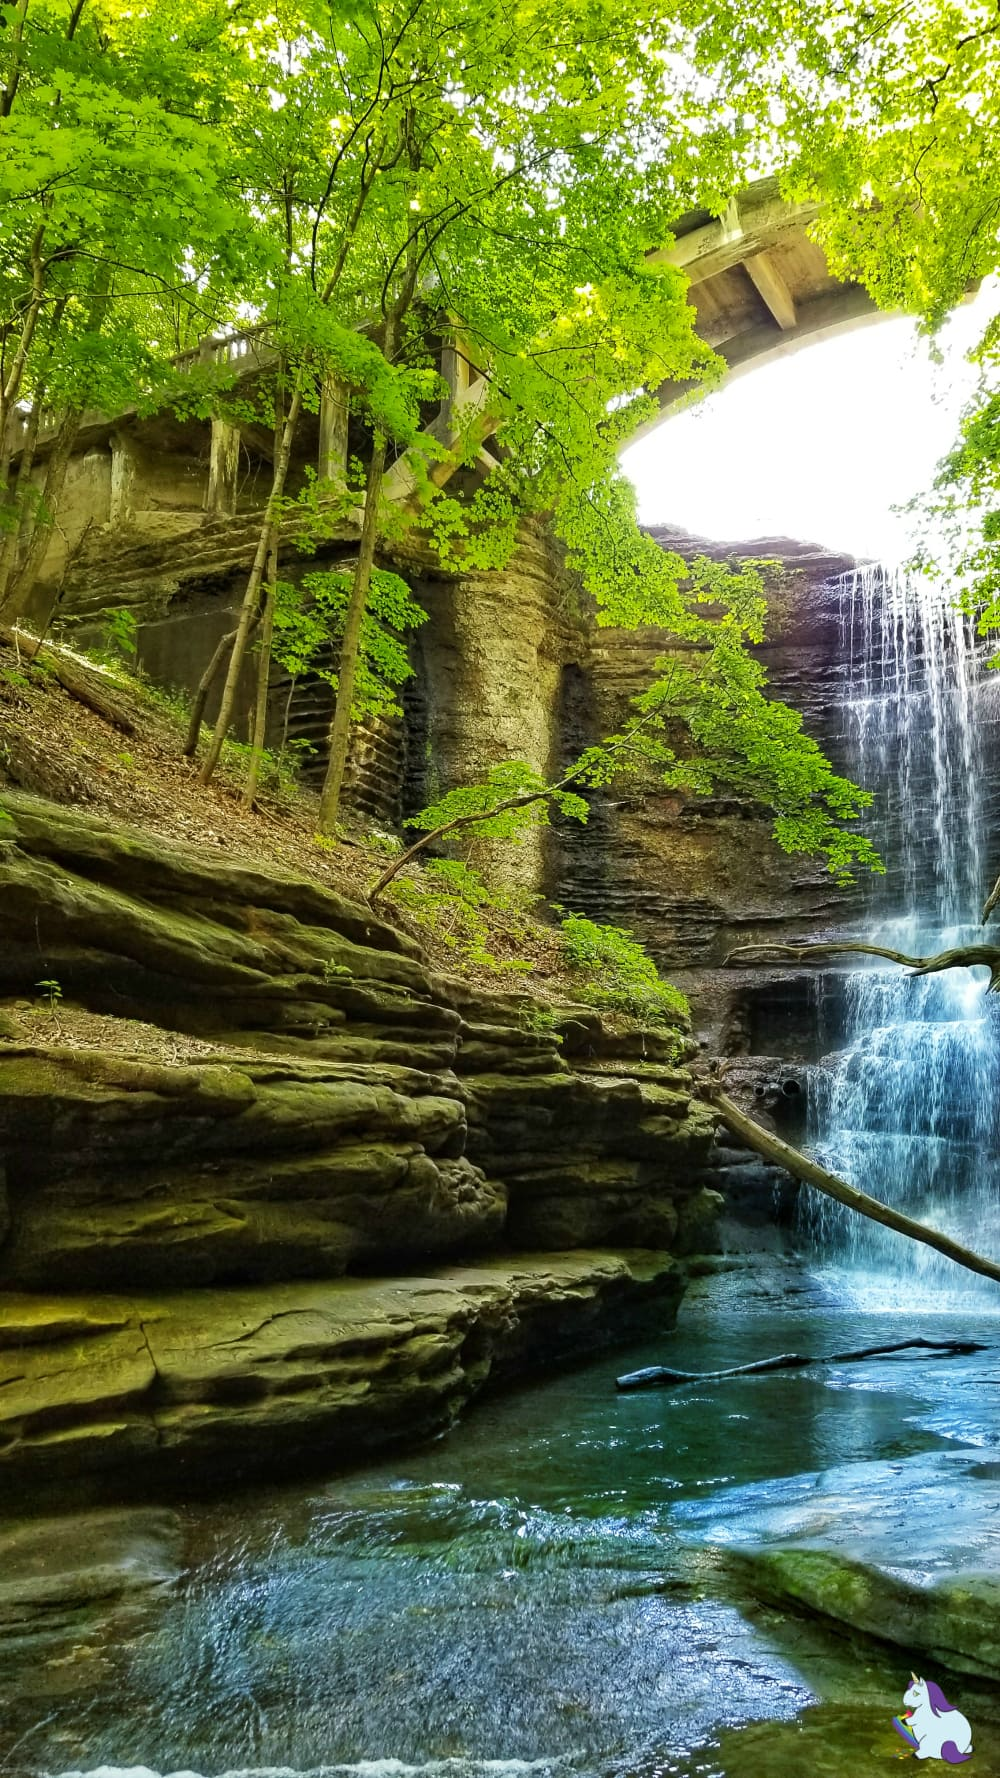 A Kia Sorento Road Trip with Wrinkles, Change, Discovery, and Waterfalls - Matthiessen State Park #utica #illinois #statepark #hiking #waterfalls